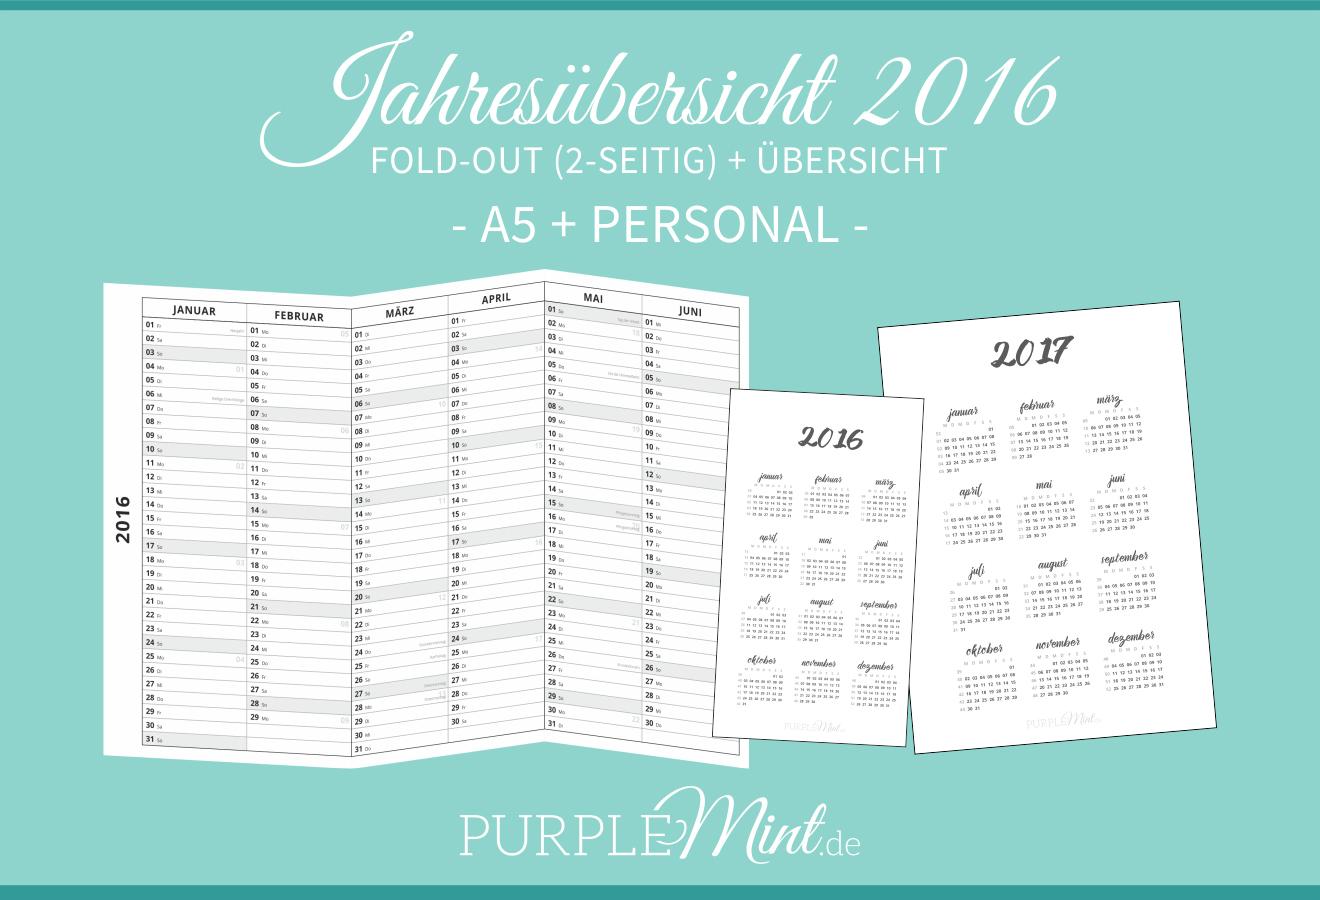 Kalender - Jahresübersicht 2016 + 2017 - A5 + Personal - Filofax / Kikki-k